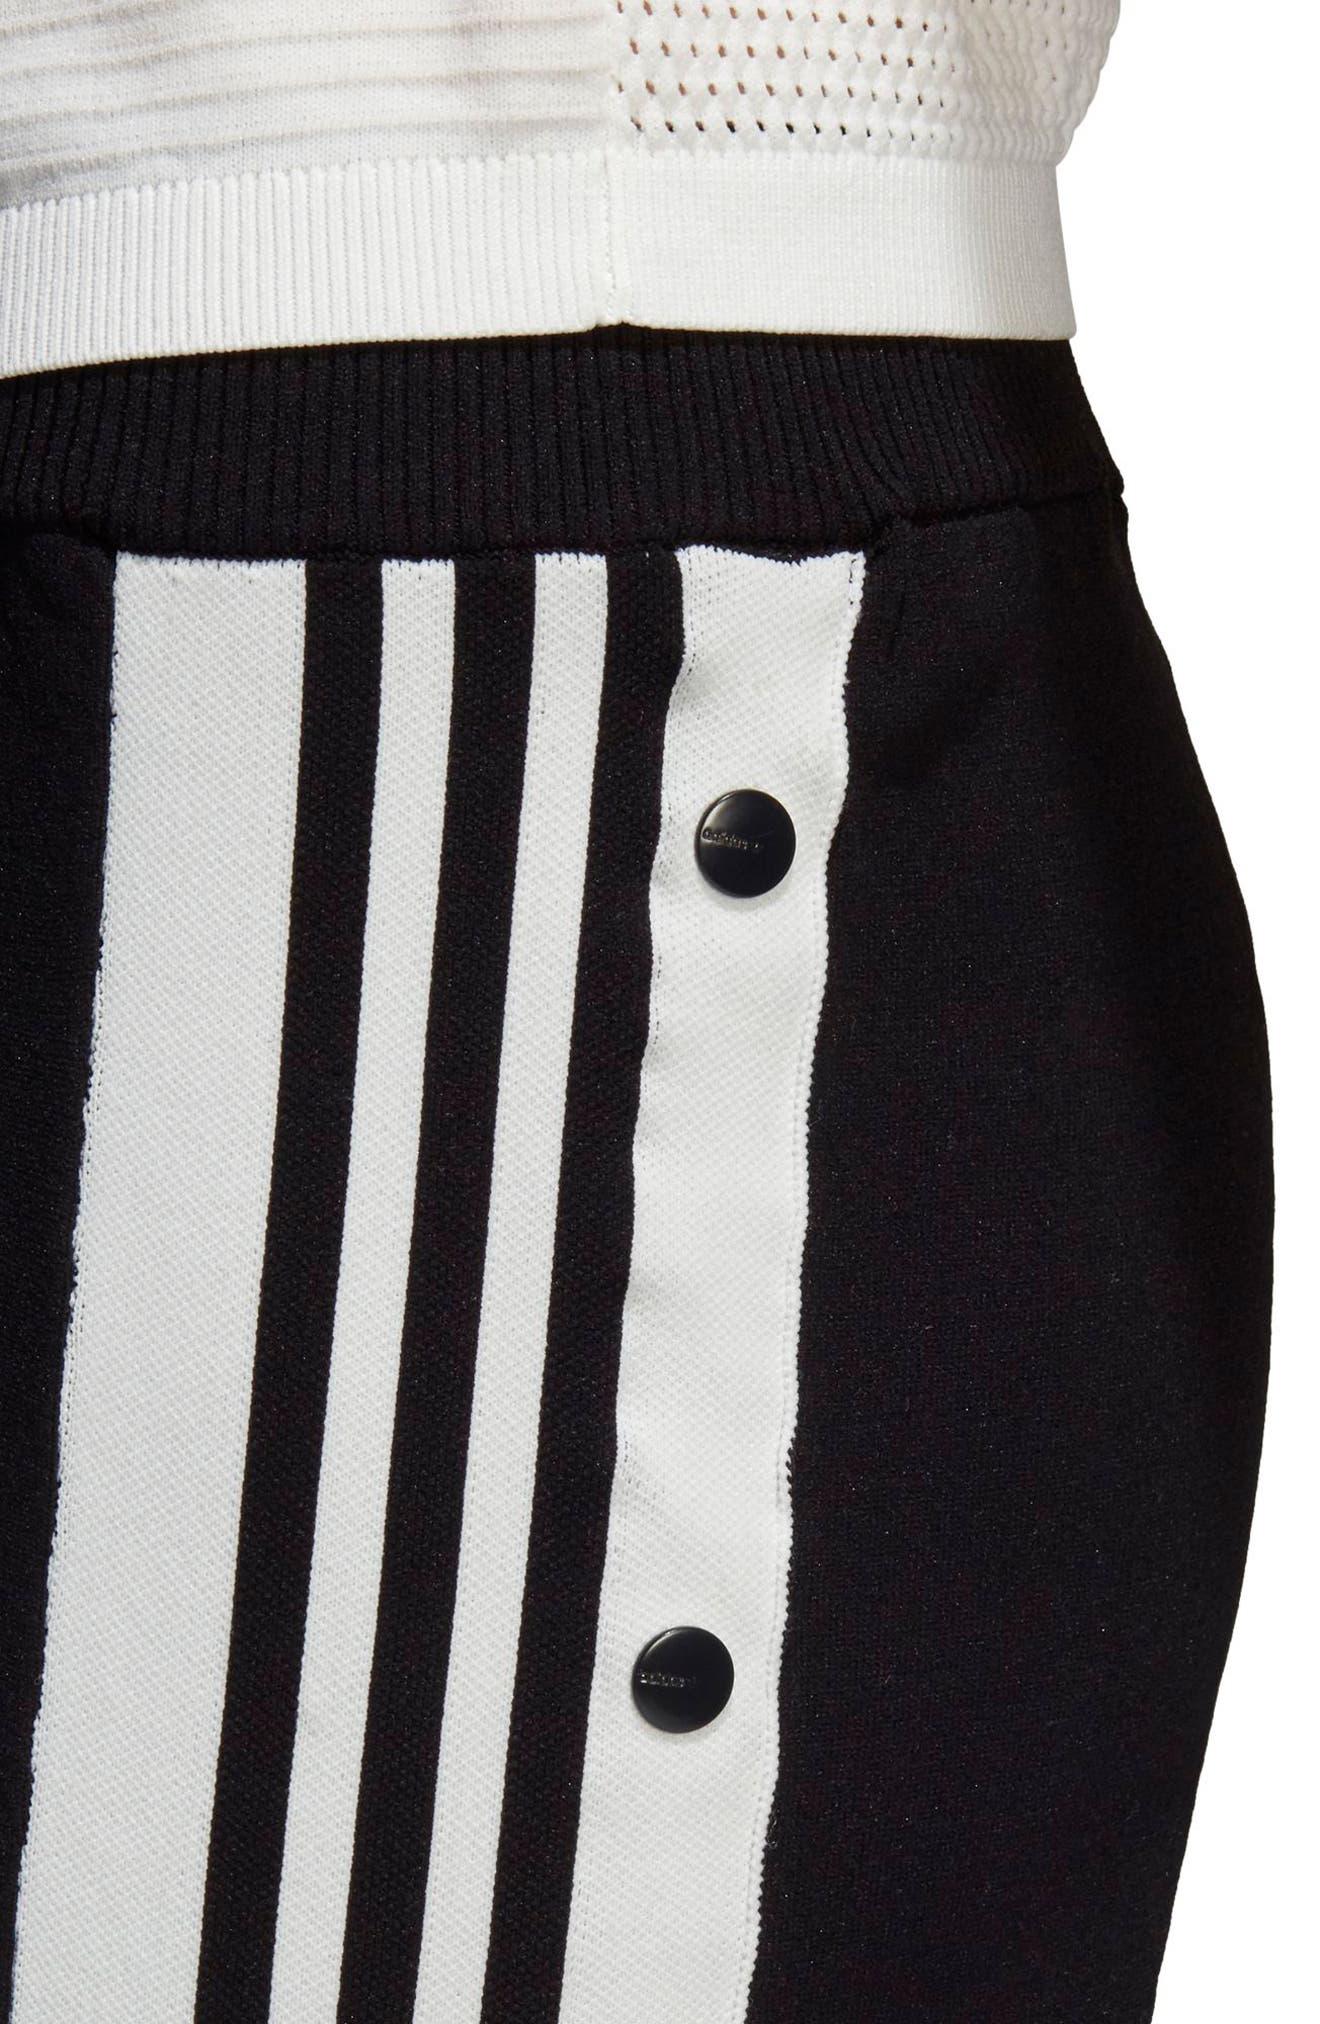 Adibreak Track Pants,                             Alternate thumbnail 8, color,                             001